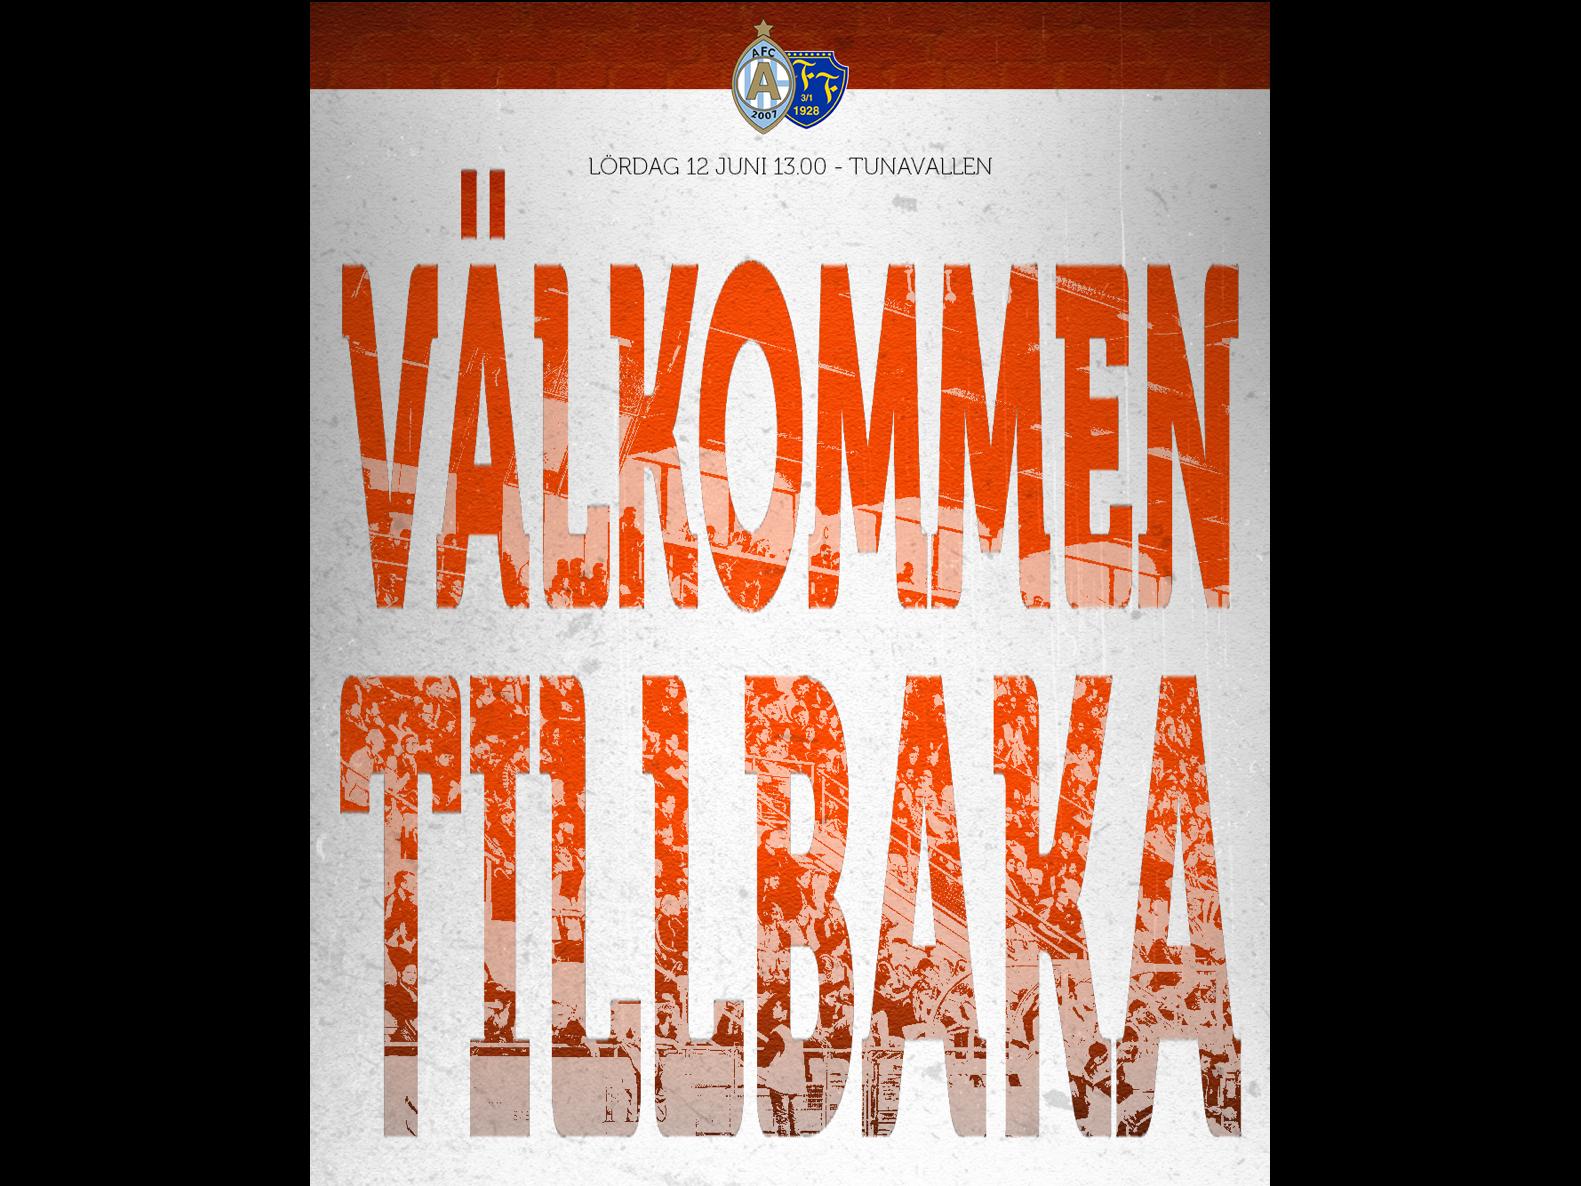 Publikinformation AFC Eskilstuna - Falkenbergs FF, 12 juni kl. 13.00